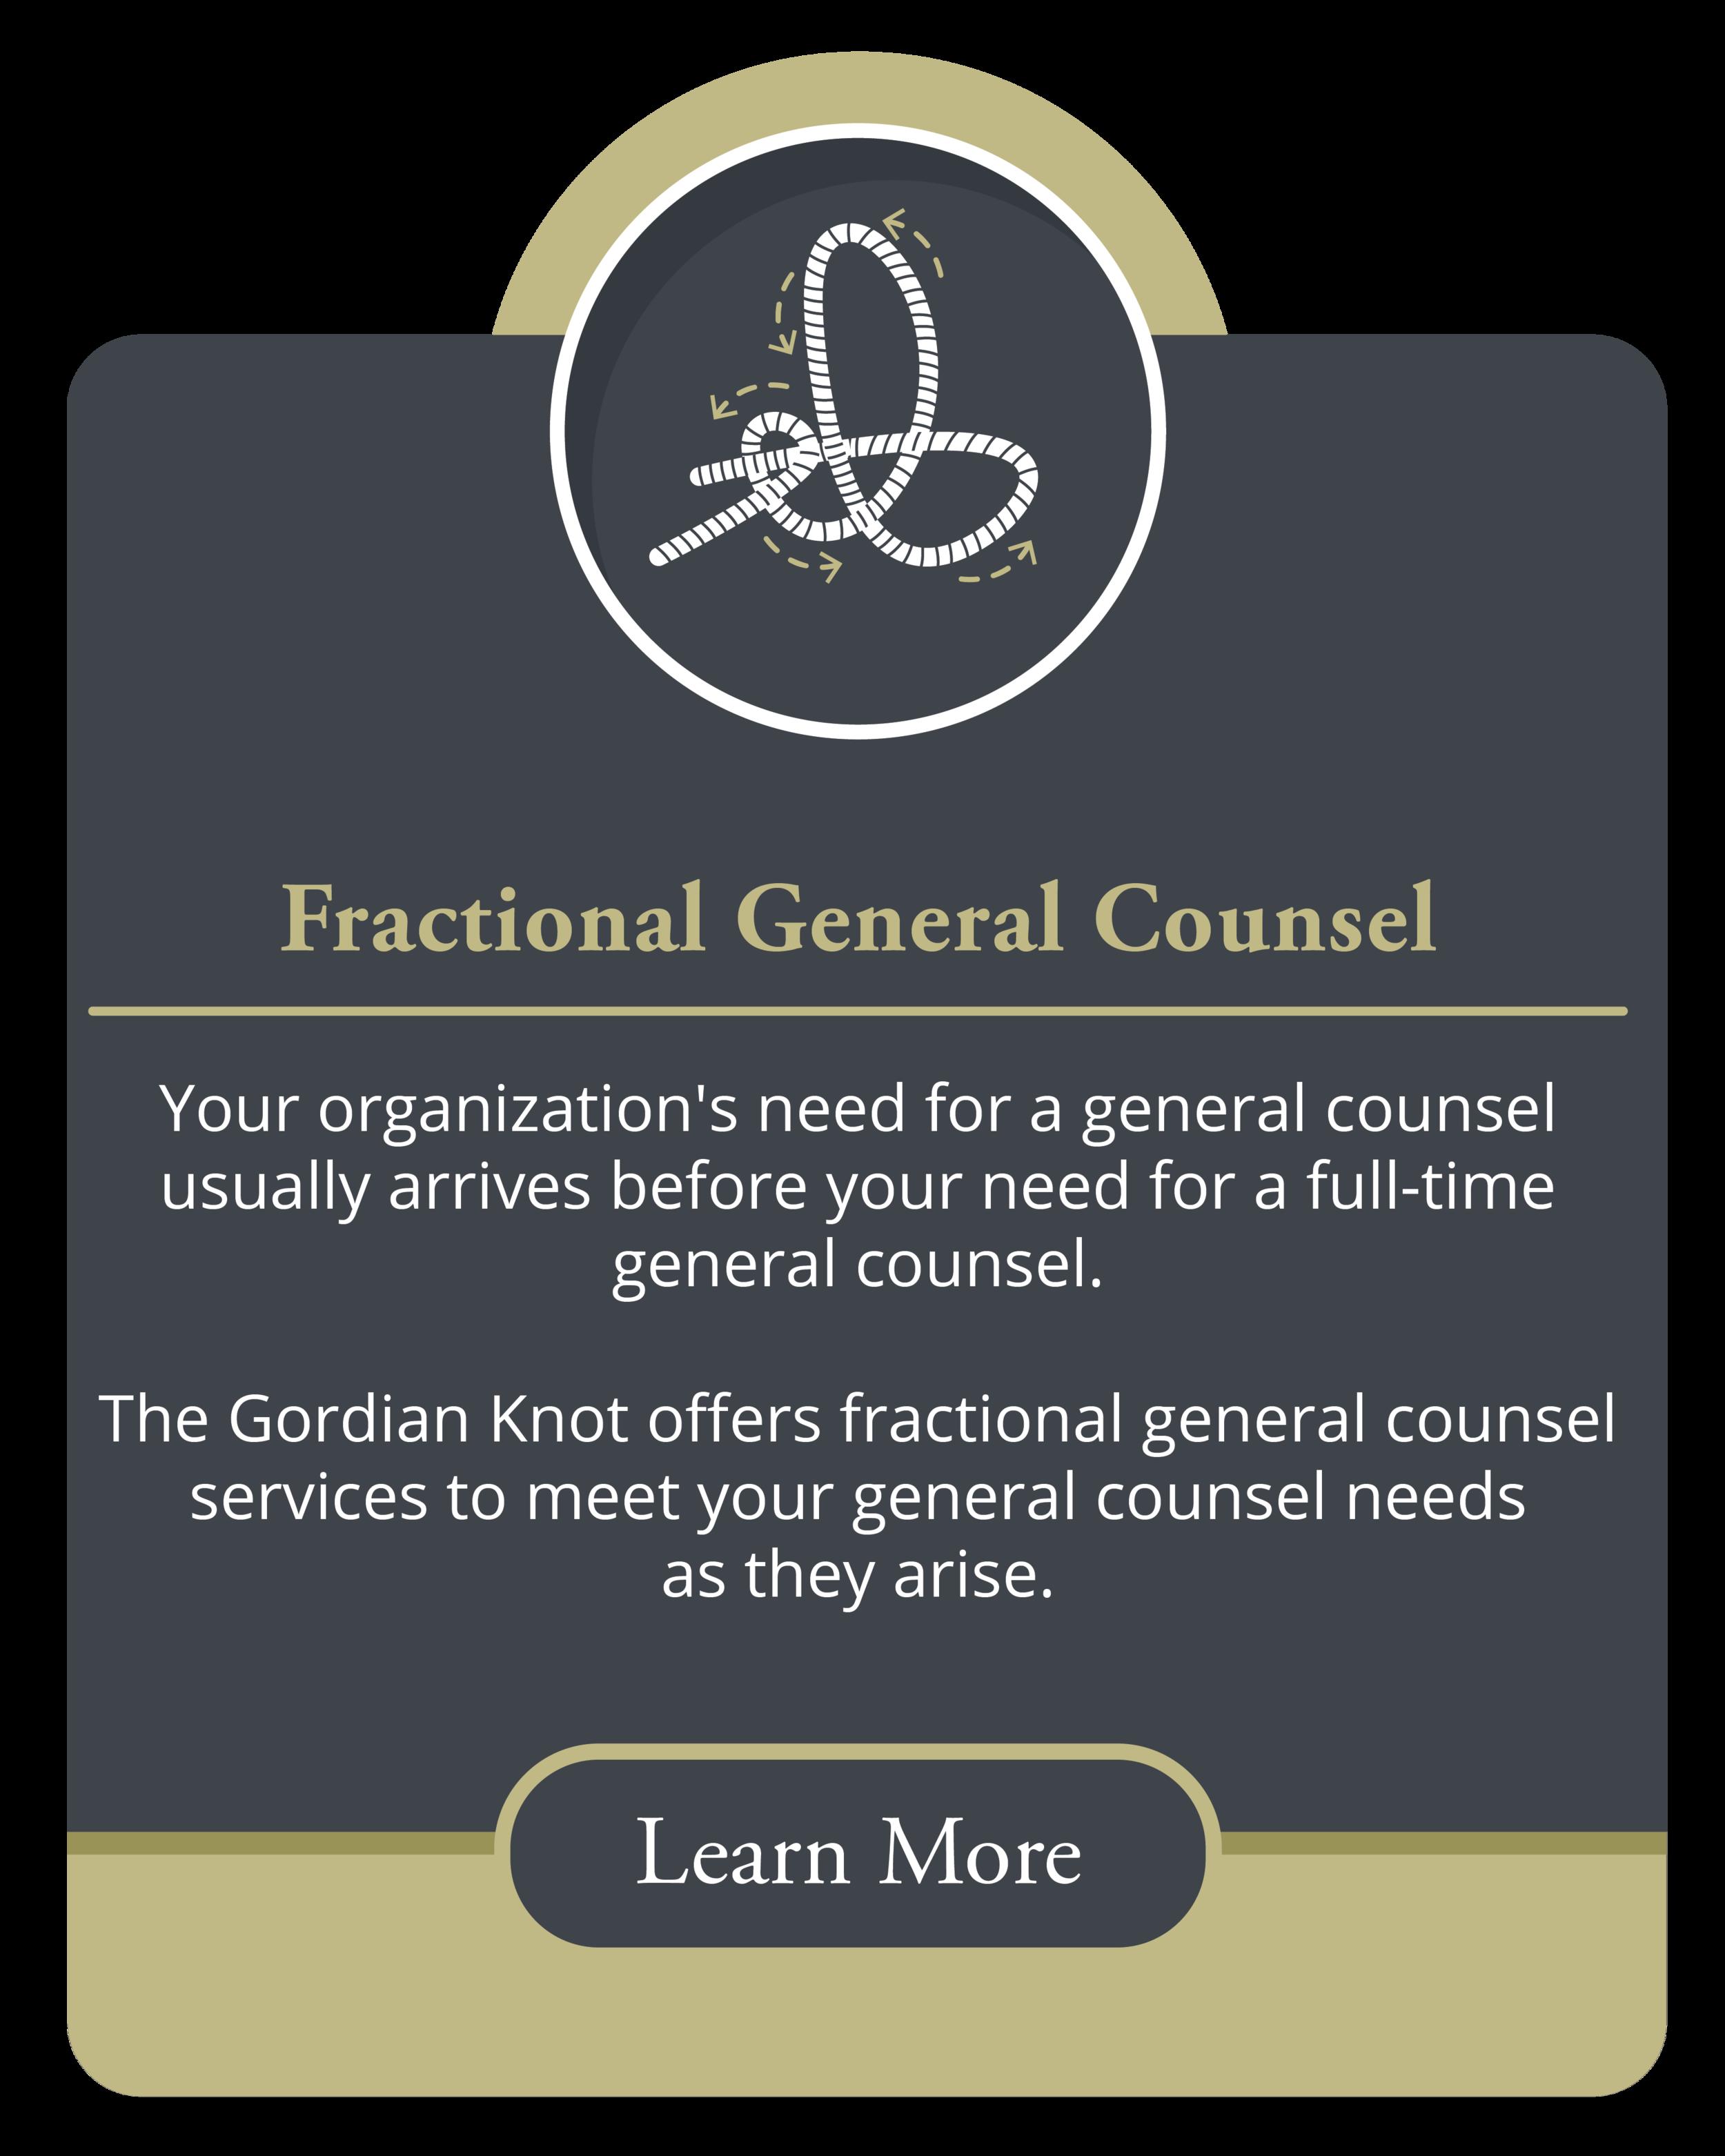 GordianKnot-service-fractional-general.png